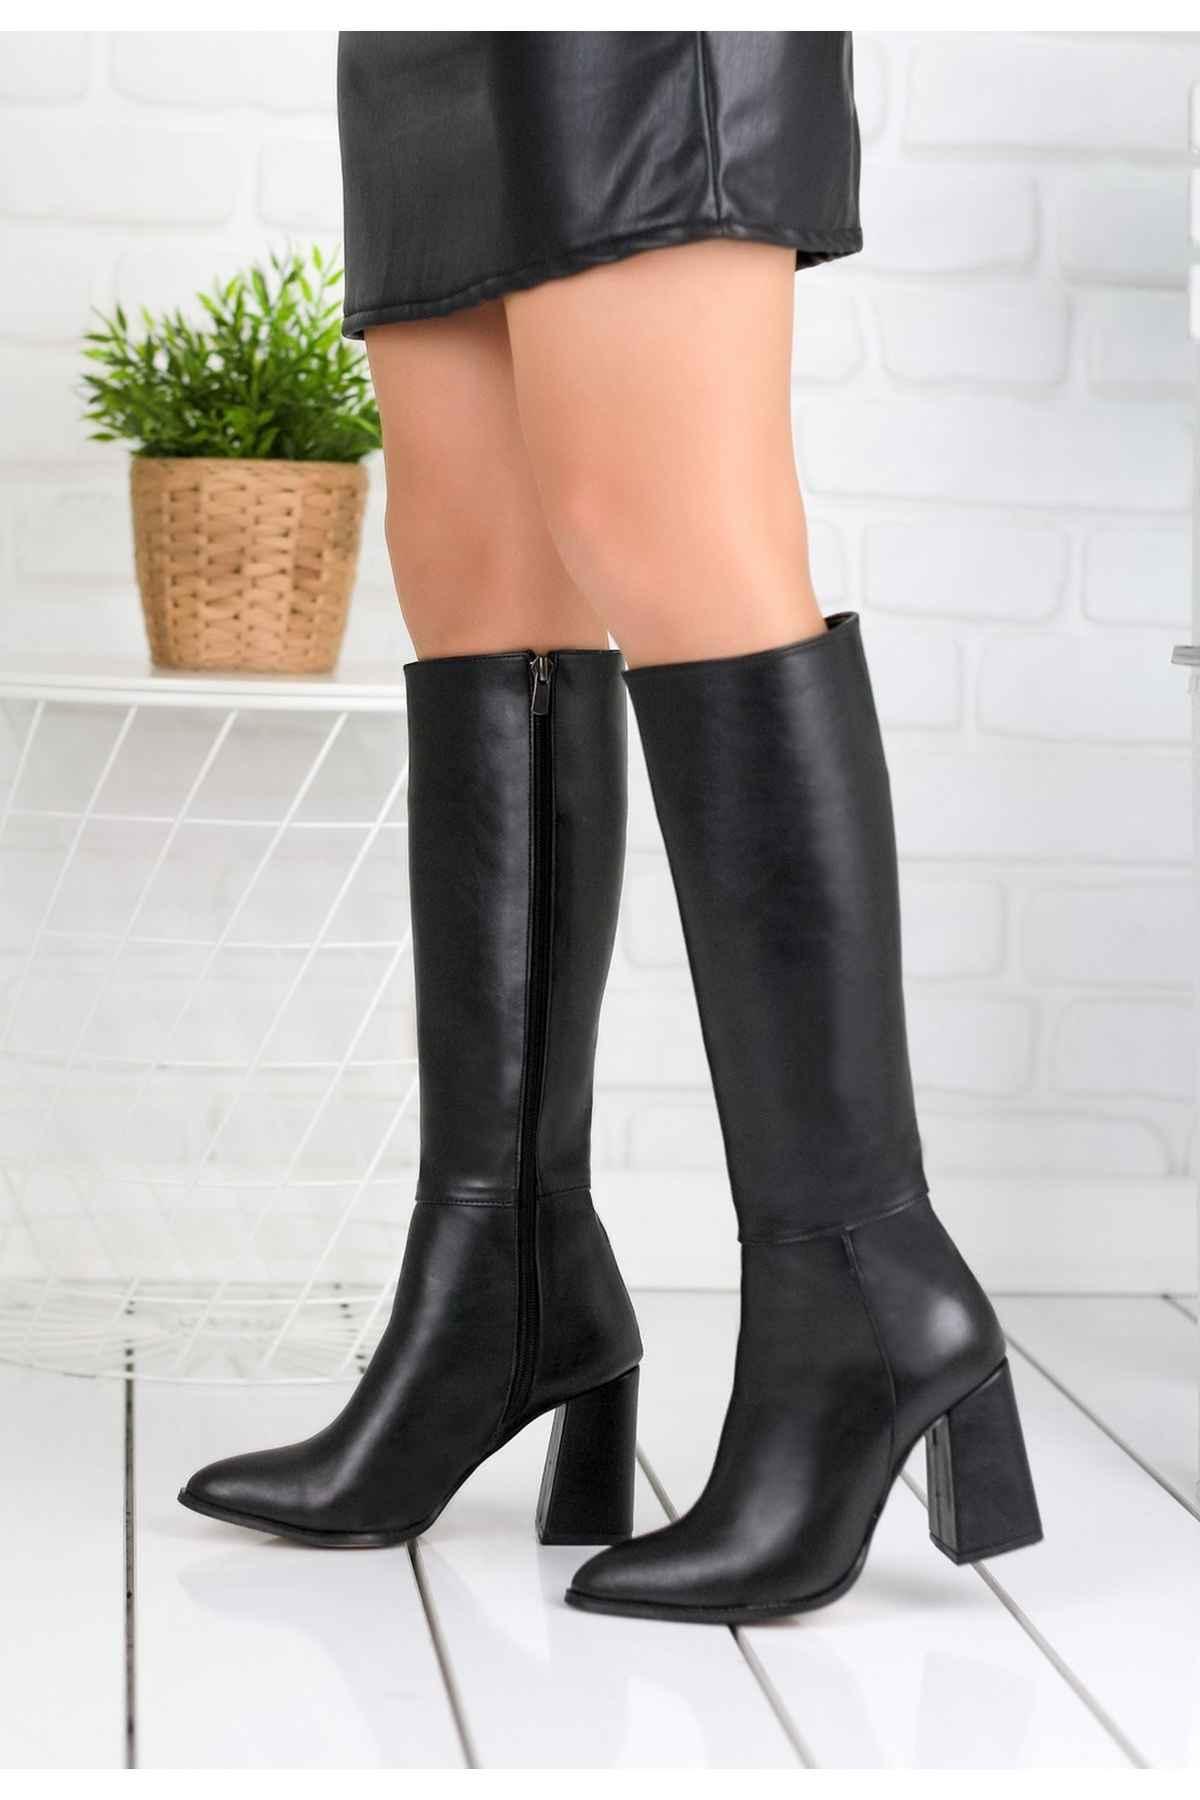 Zalmira Bayan Çizme Modelleri